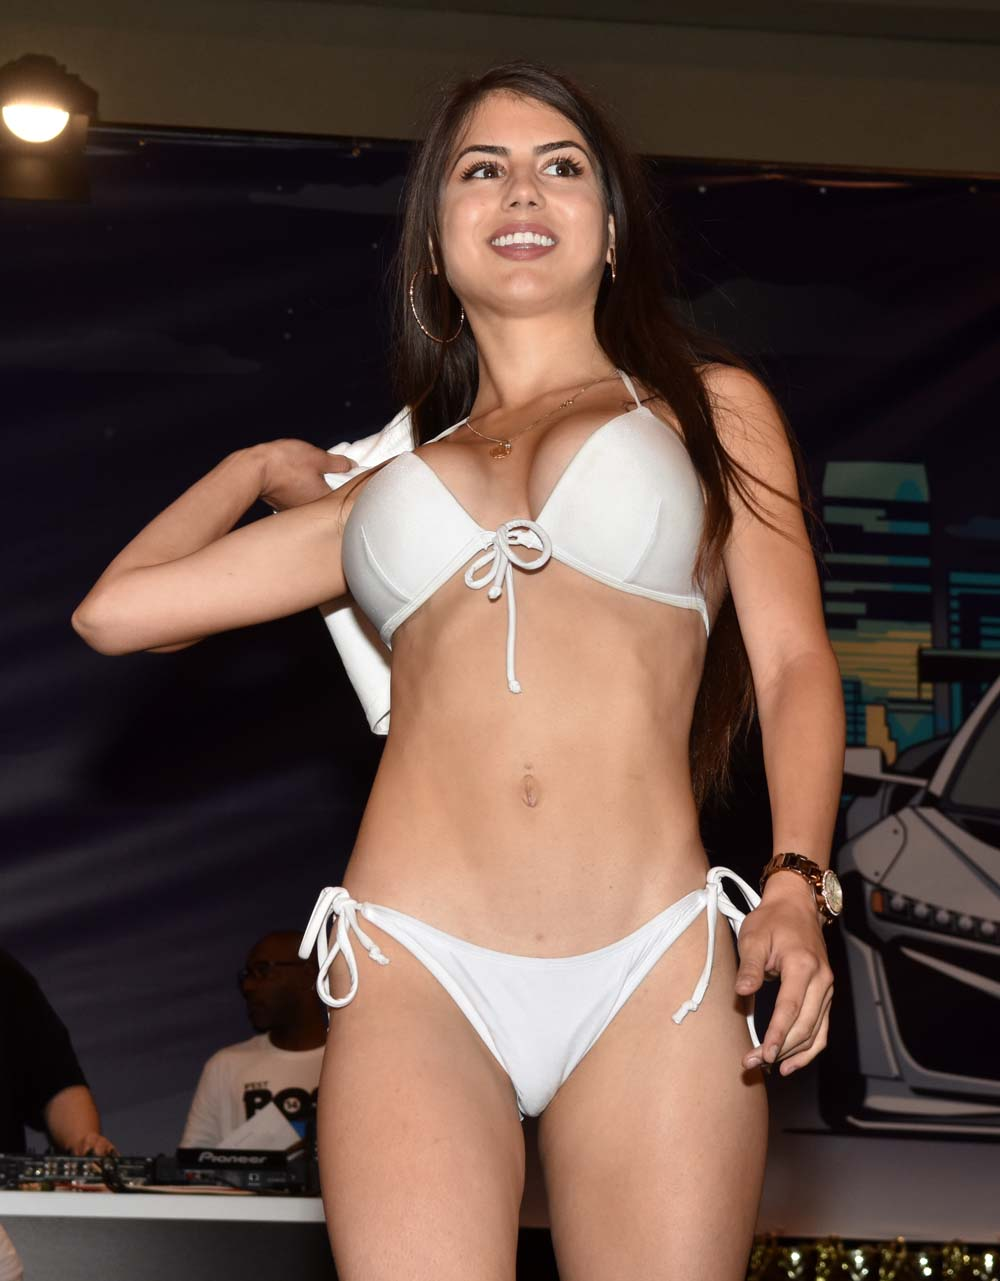 Erotic asian girl actors